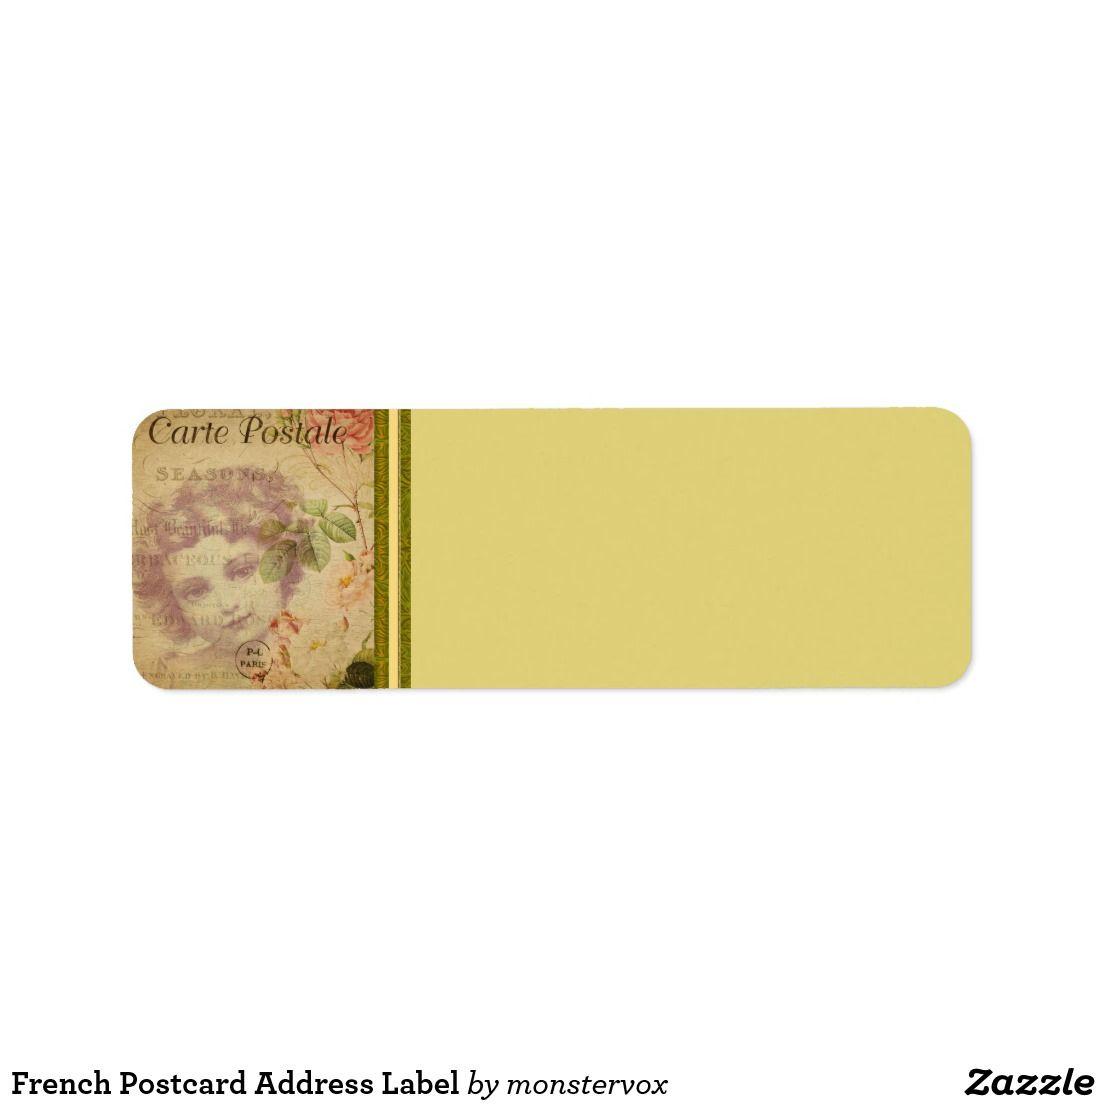 French Postcard Address Label | Zazzle com | My Zazzle Products at